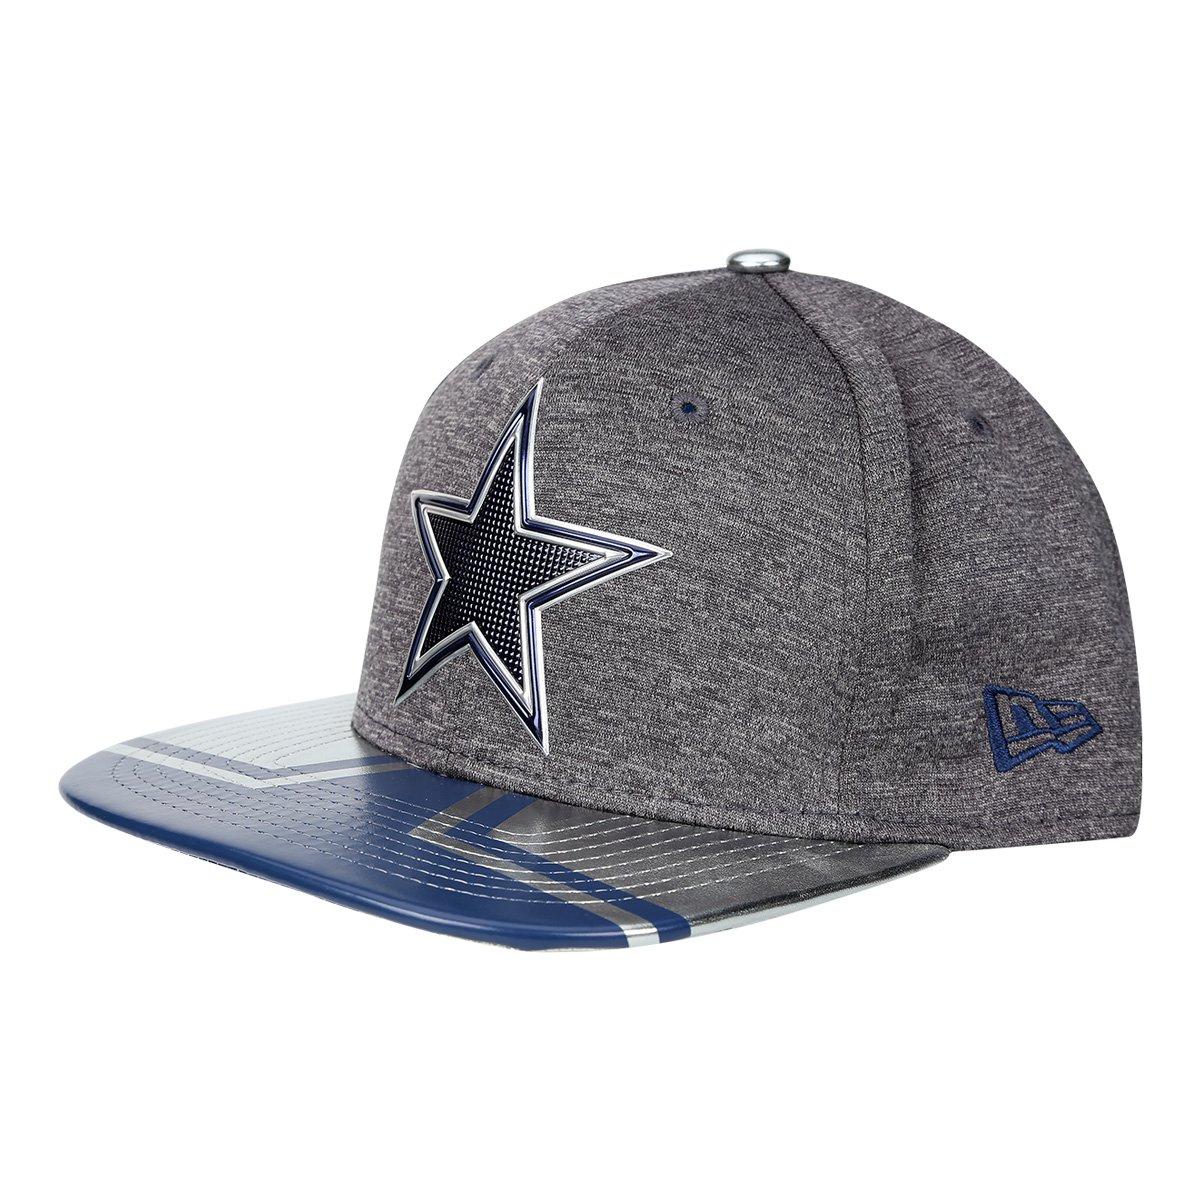 Boné New Era Dallas Cowboys Aba Reta 950 Original Fit Sn Spotlight  Masculino - Compre Agora  4ed6b98972483